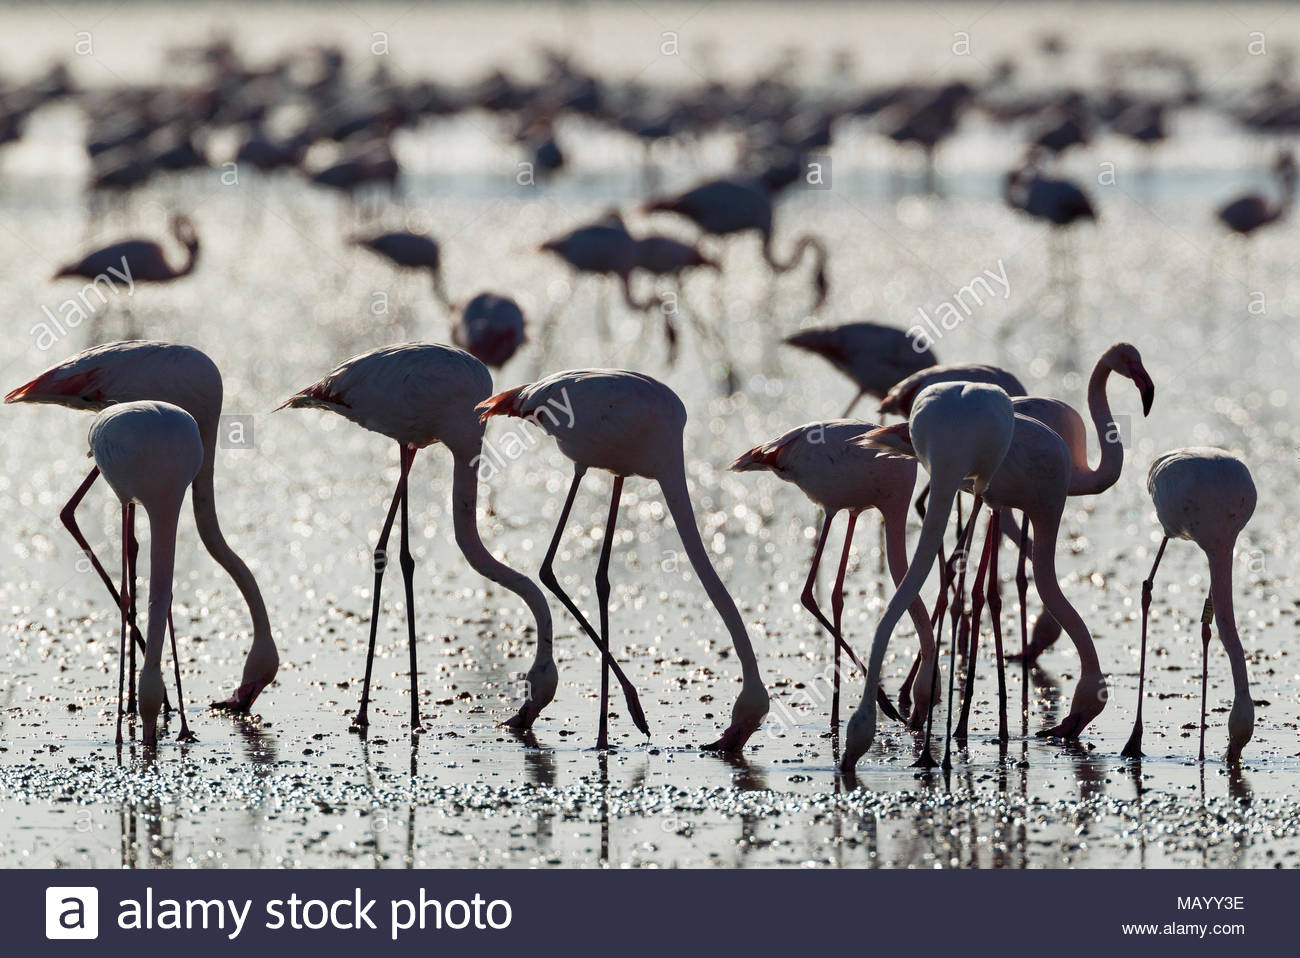 Flamingos (Phoenicopterus Roseus), Fütterung, Silhouette, Hintergrundbeleuchtung, Provinz Malaga, Andalusien, Spanien Stockbild